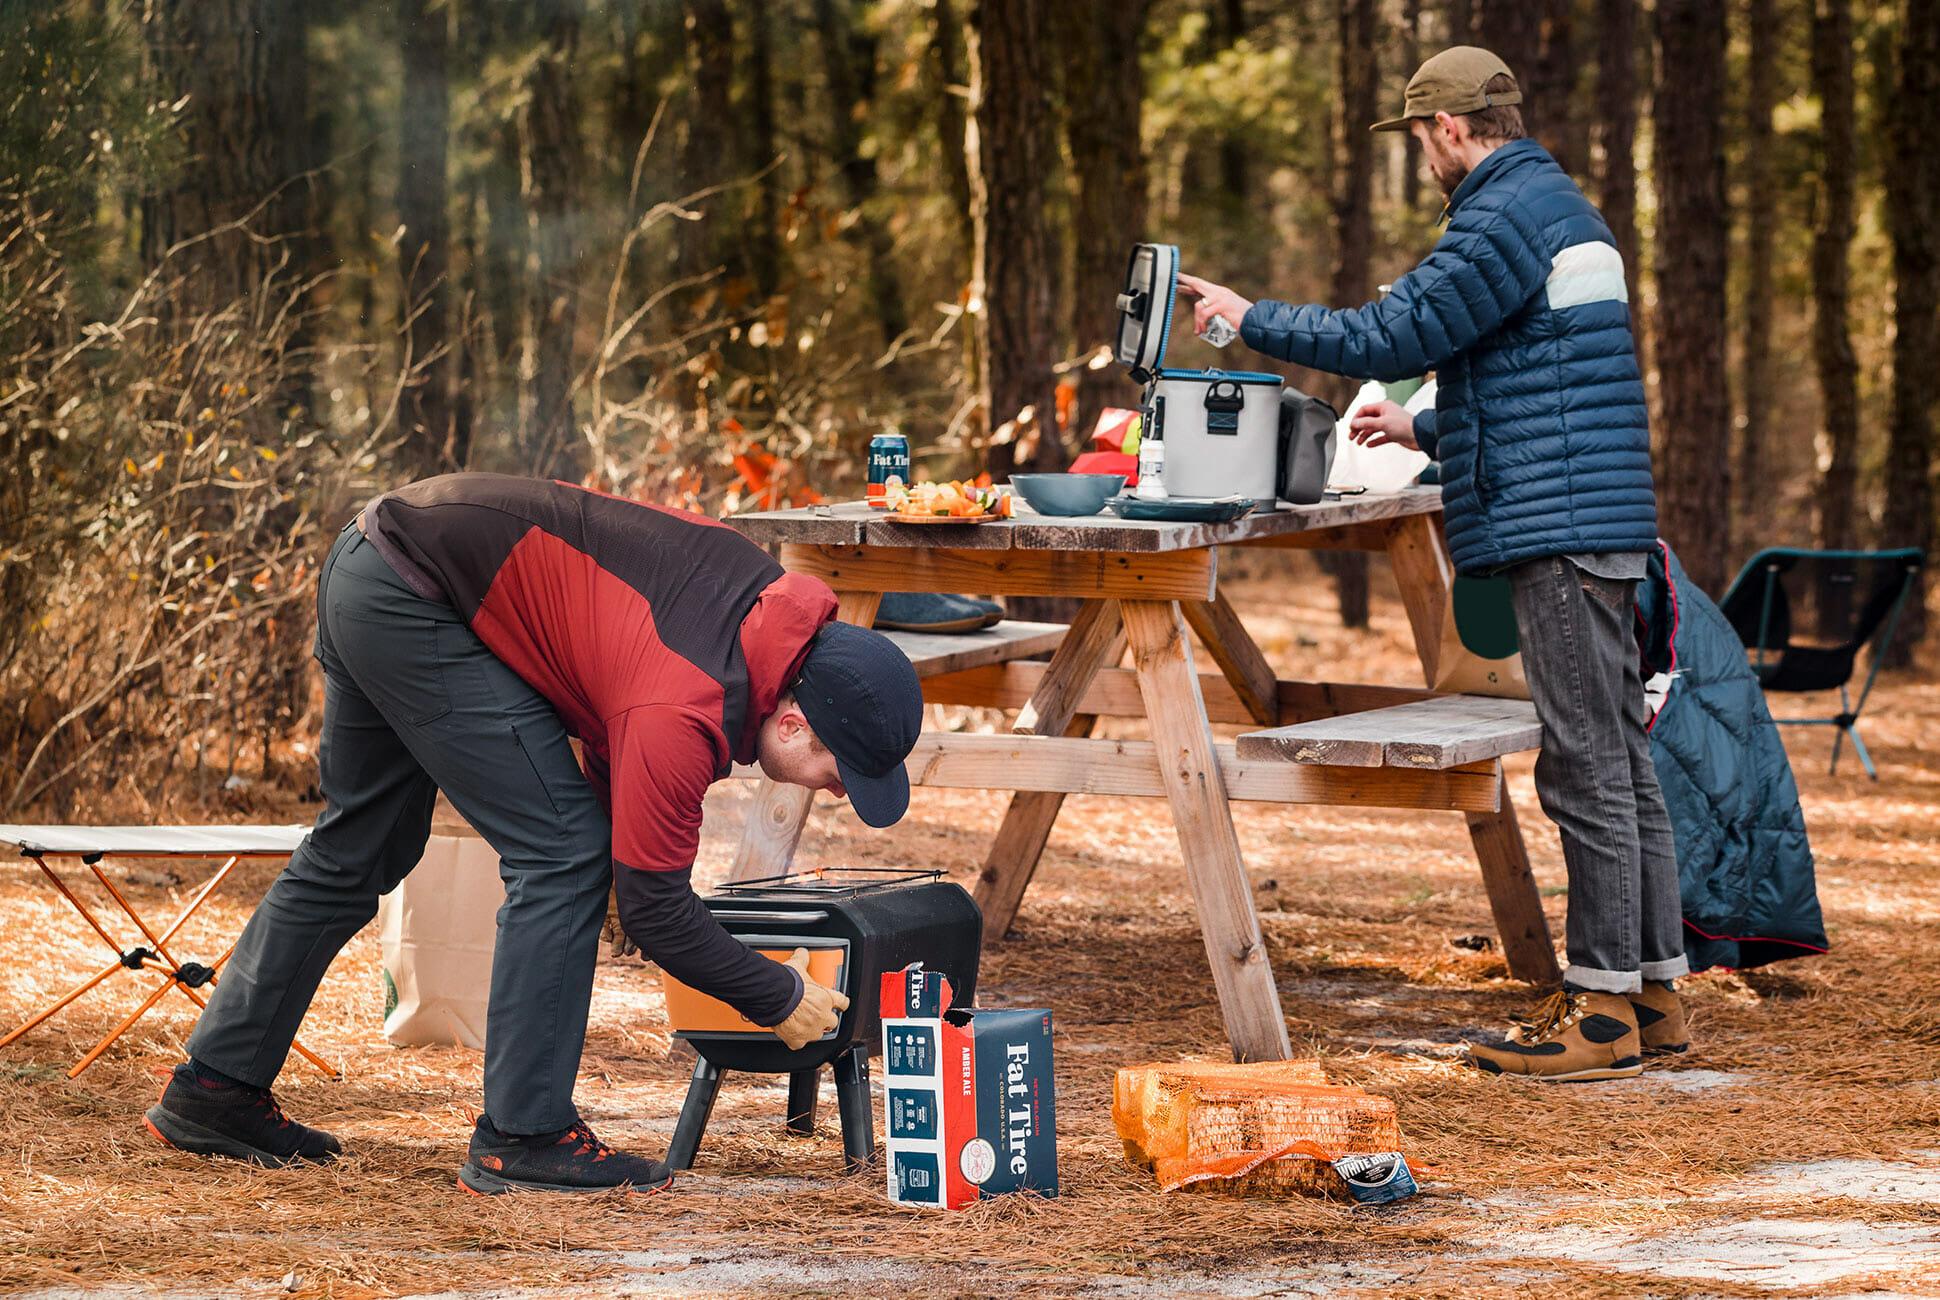 eight-camping-updates-gear-patrol-2-full-lead.jpg